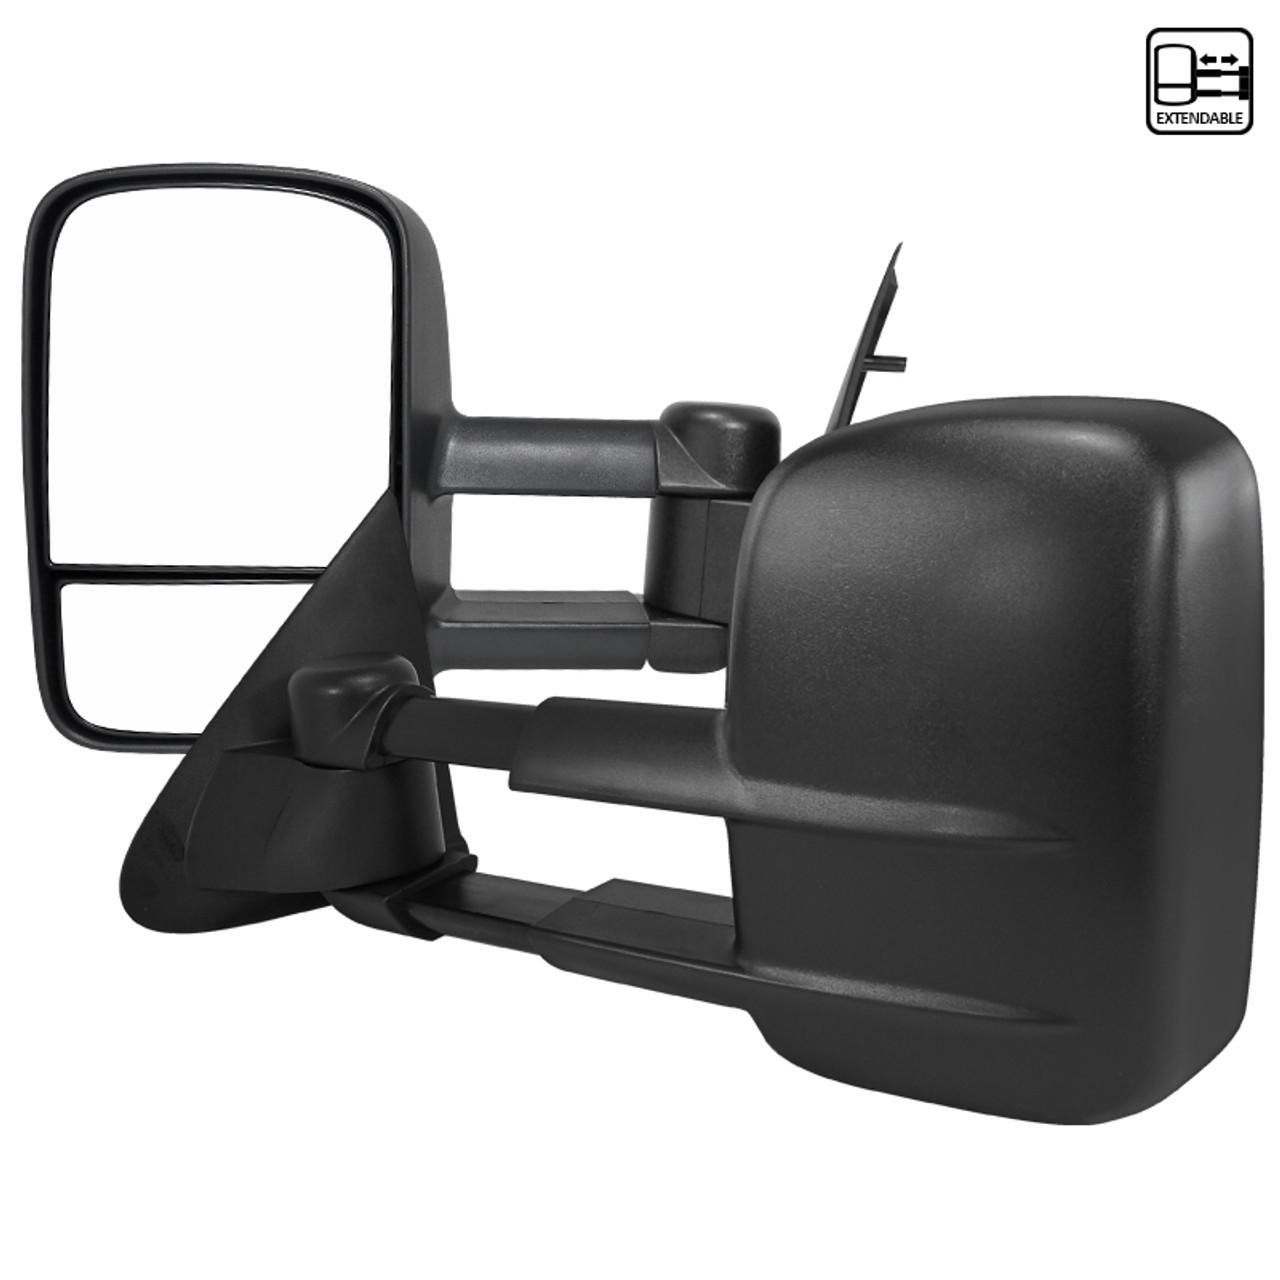 Automotive Mirrors ispacegoa.com 2 New OEM Ford Manual Telescopic ...